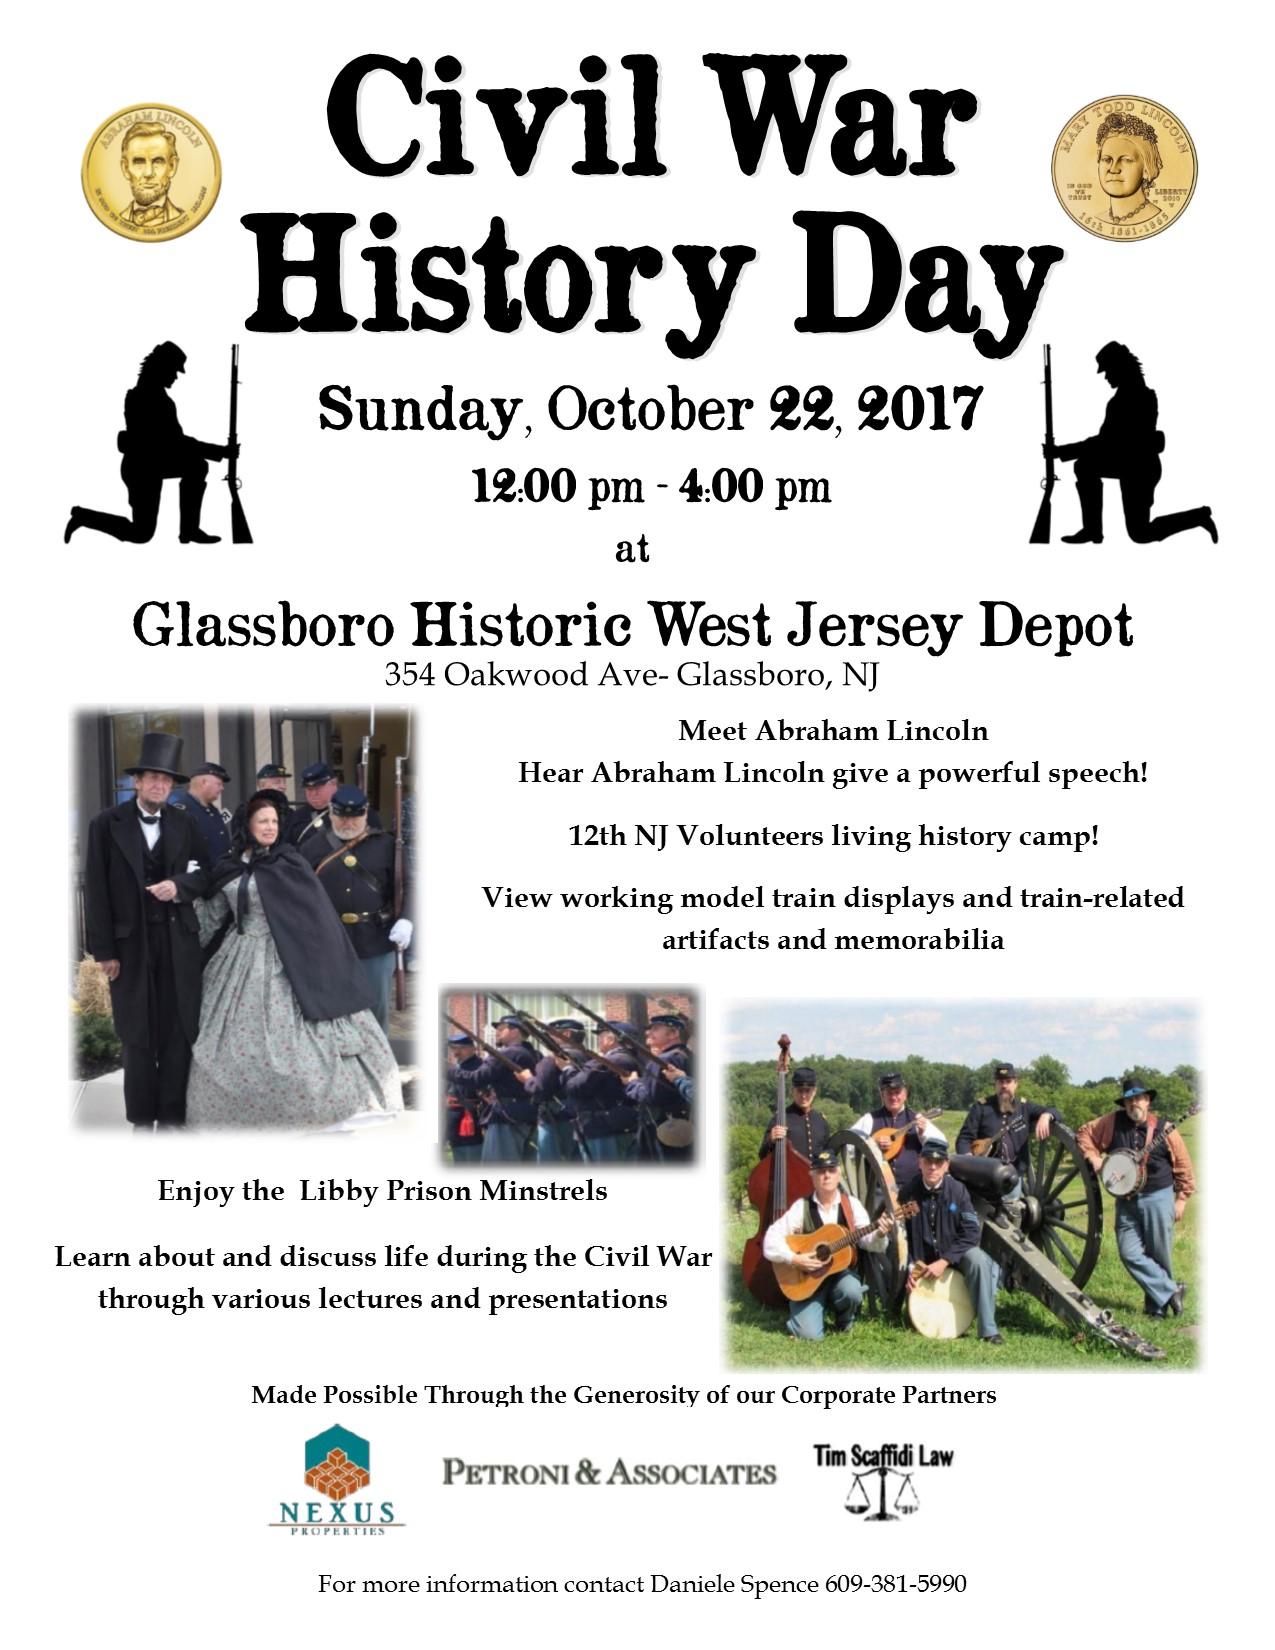 glassboro Civil War history day